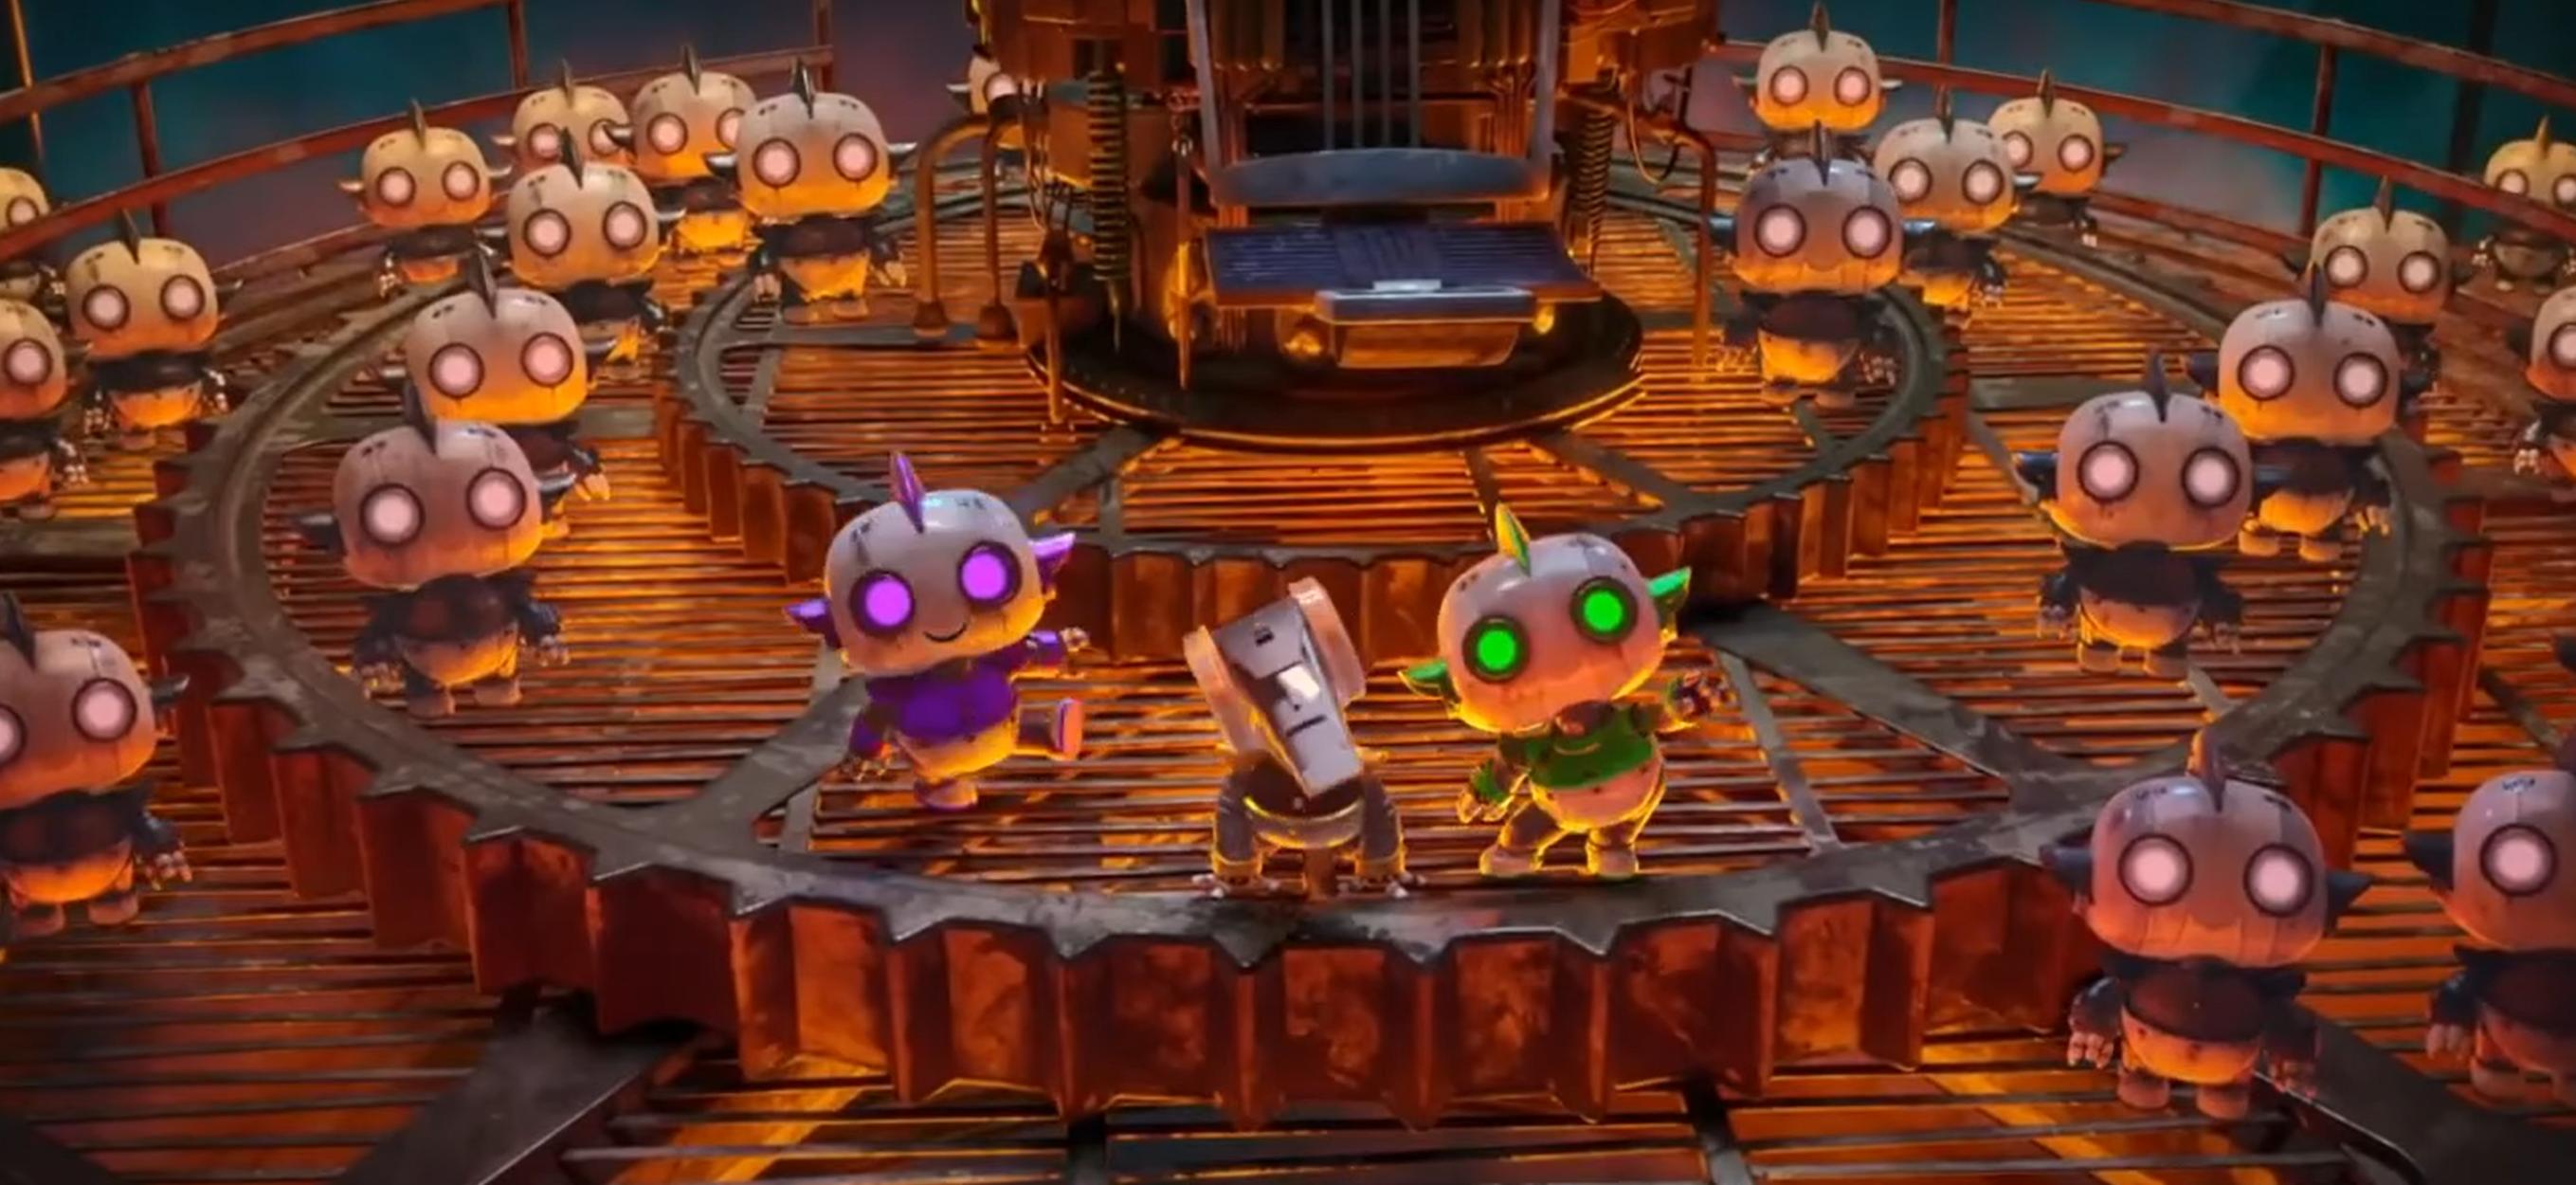 Rotten Robots